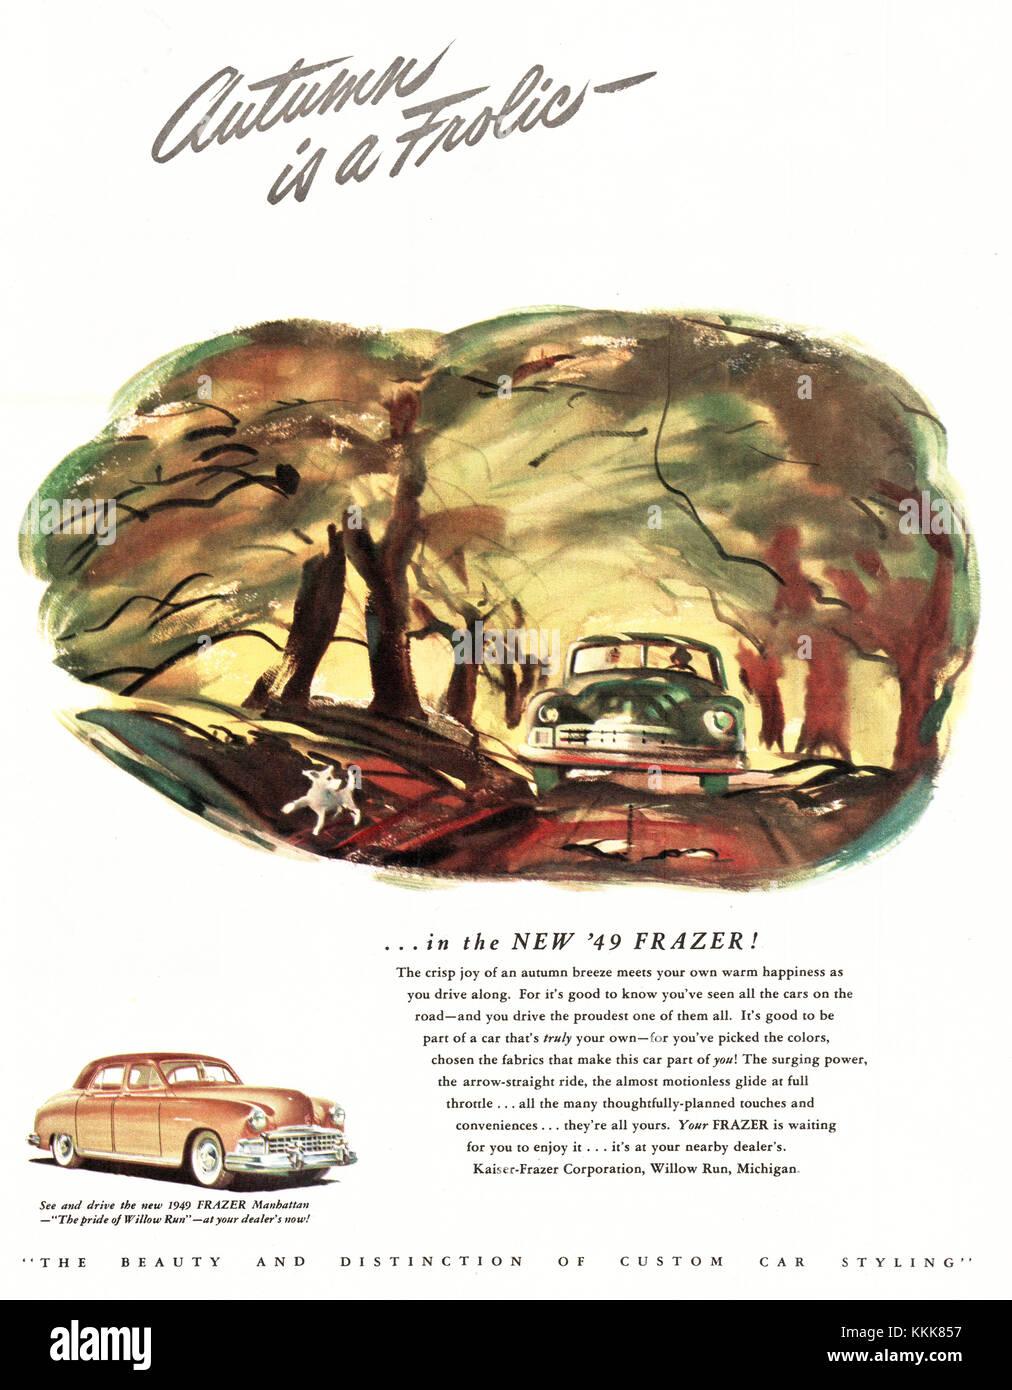 1948 U.S. Magazine Kaiser Frazer Car Advert Stock Photo, Royalty ...